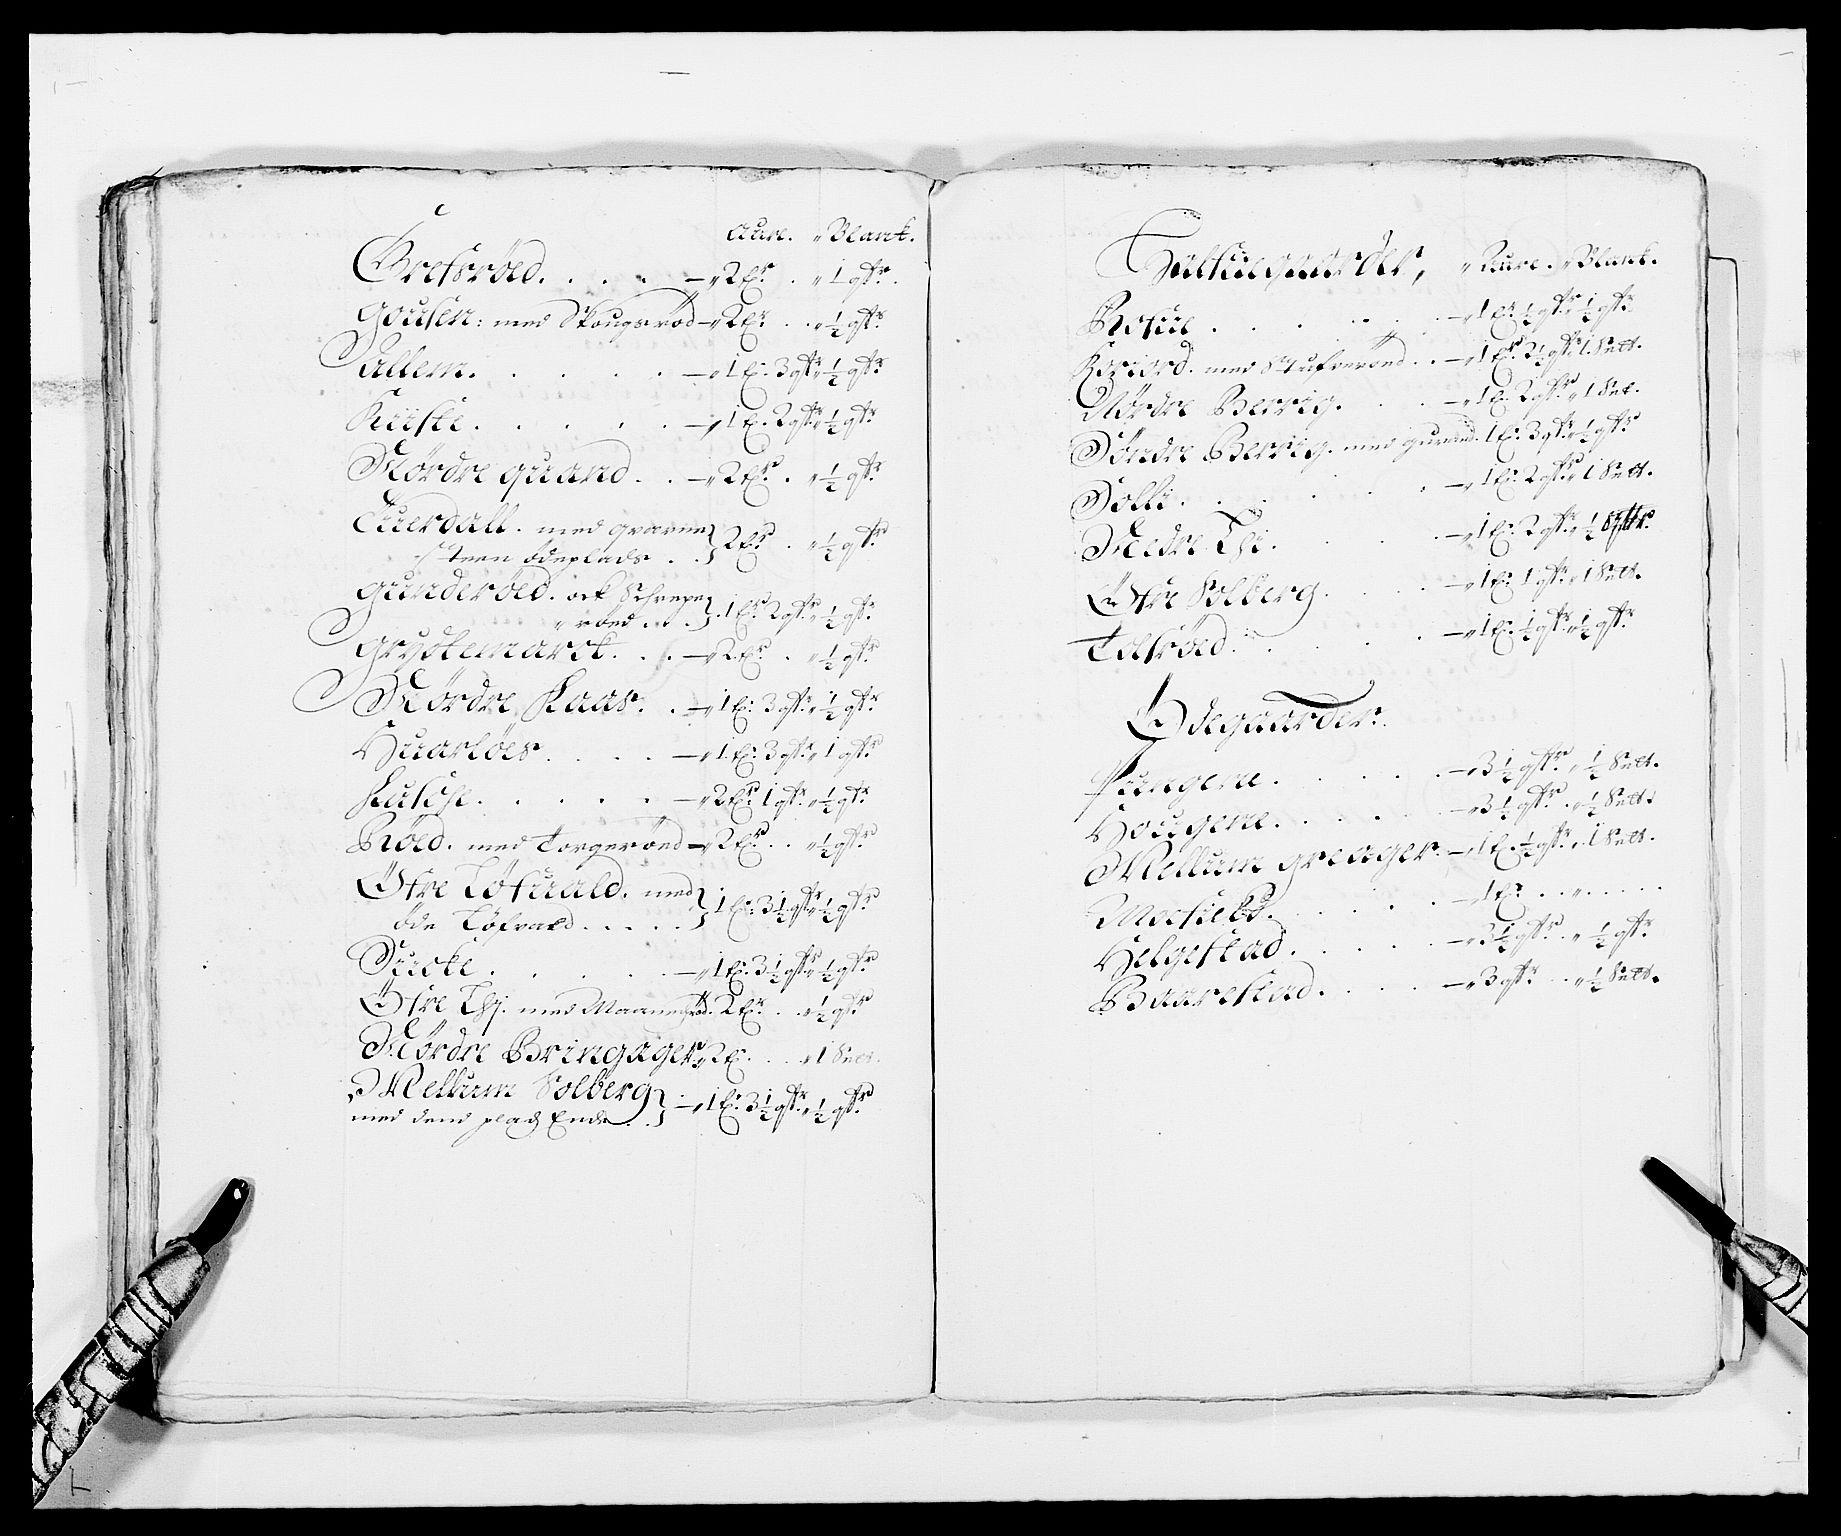 RA, Rentekammeret inntil 1814, Reviderte regnskaper, Fogderegnskap, R32/L1857: Fogderegnskap Jarlsberg grevskap, 1686-1690, s. 356